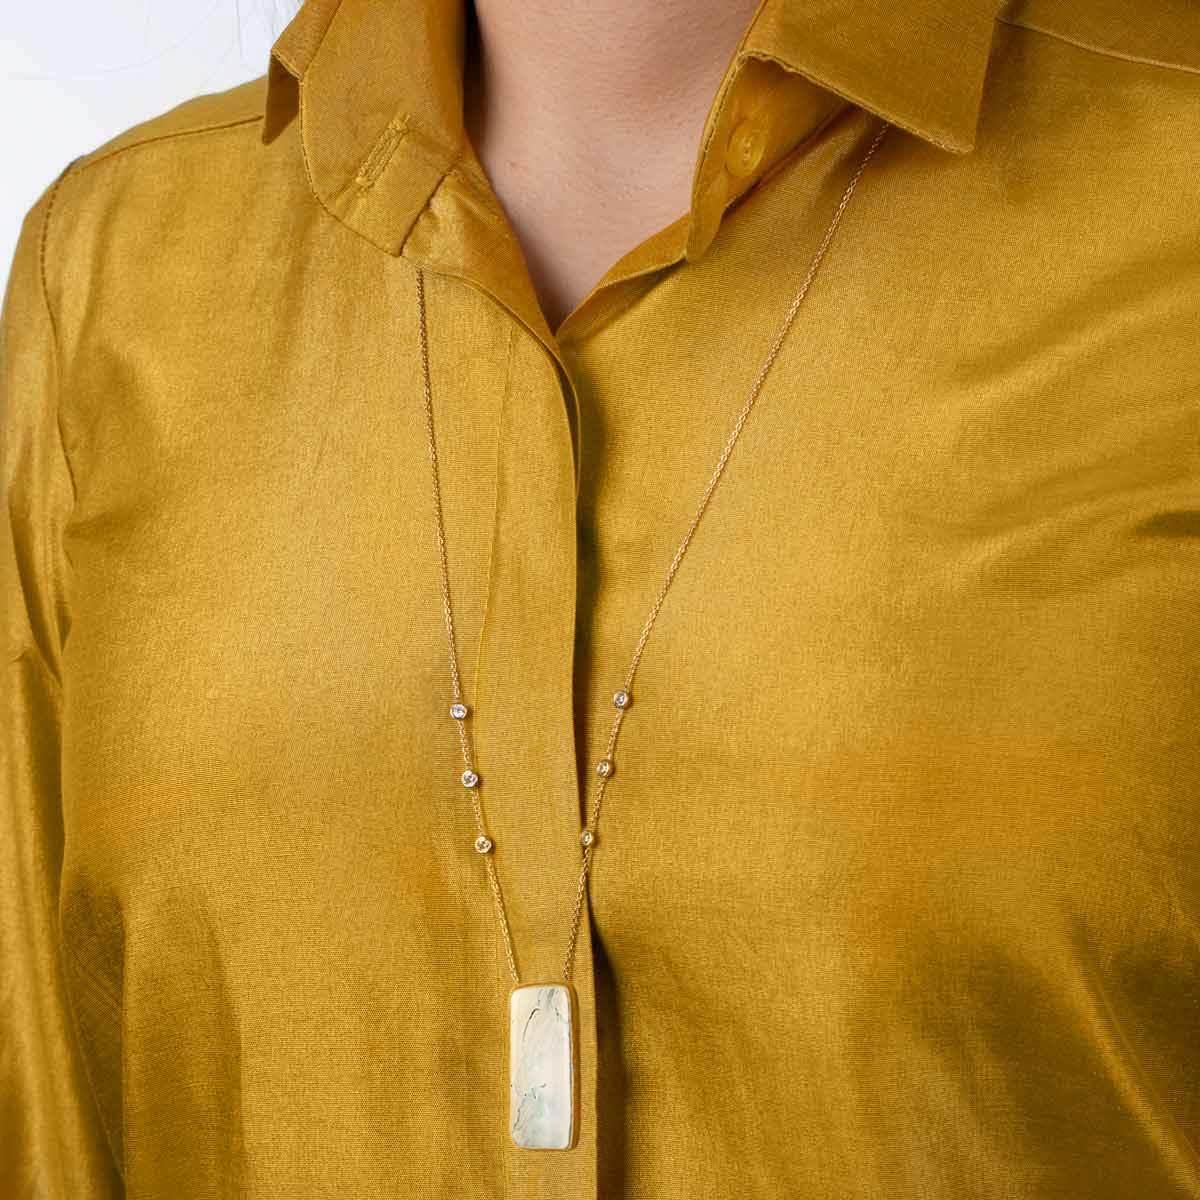 گردنبند طلا پاندلا مستطیل